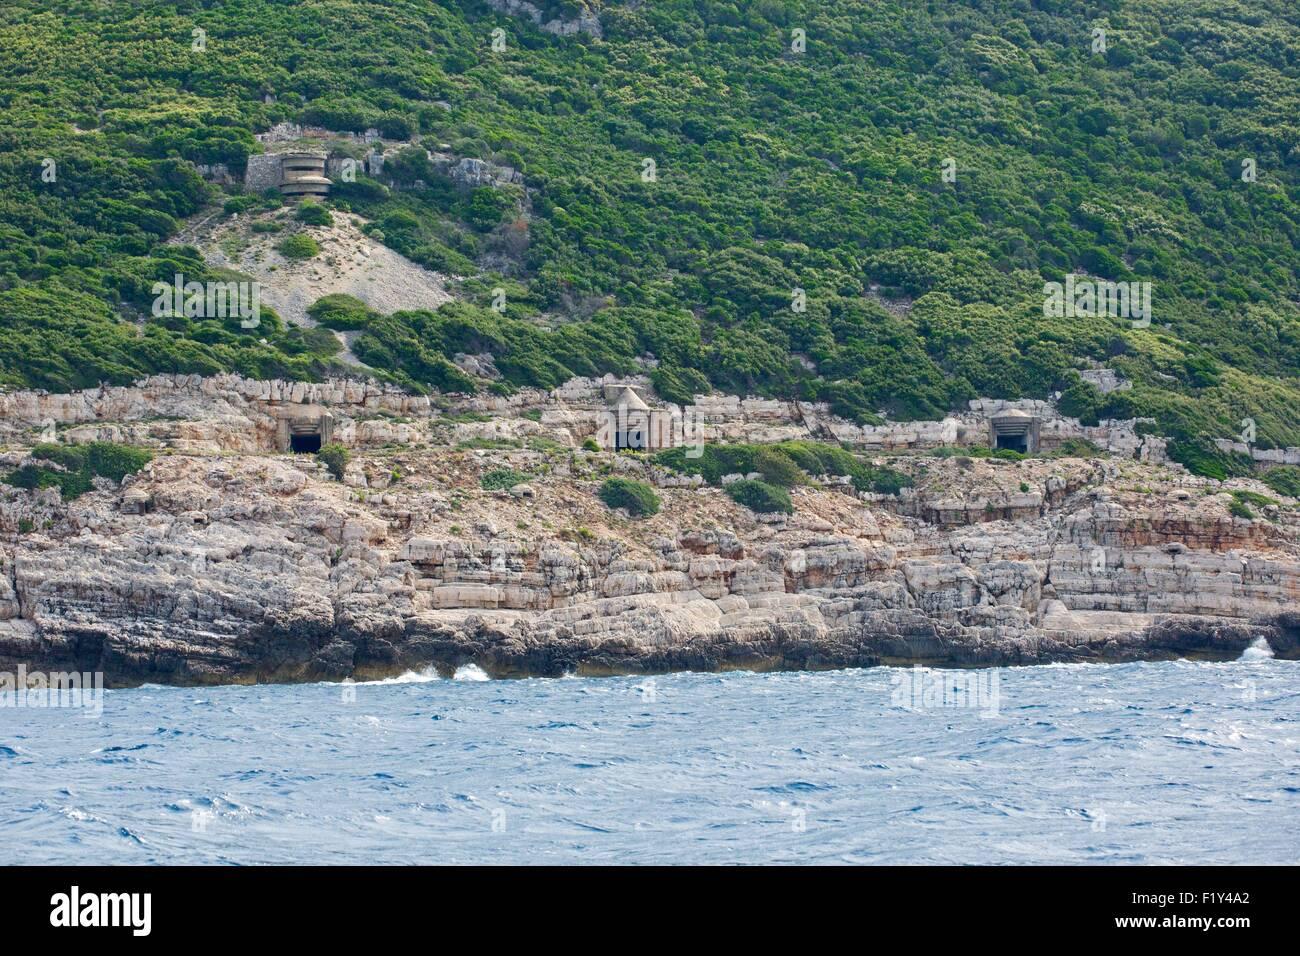 Albania, Vlora, Sazan island, bunker - Stock Image